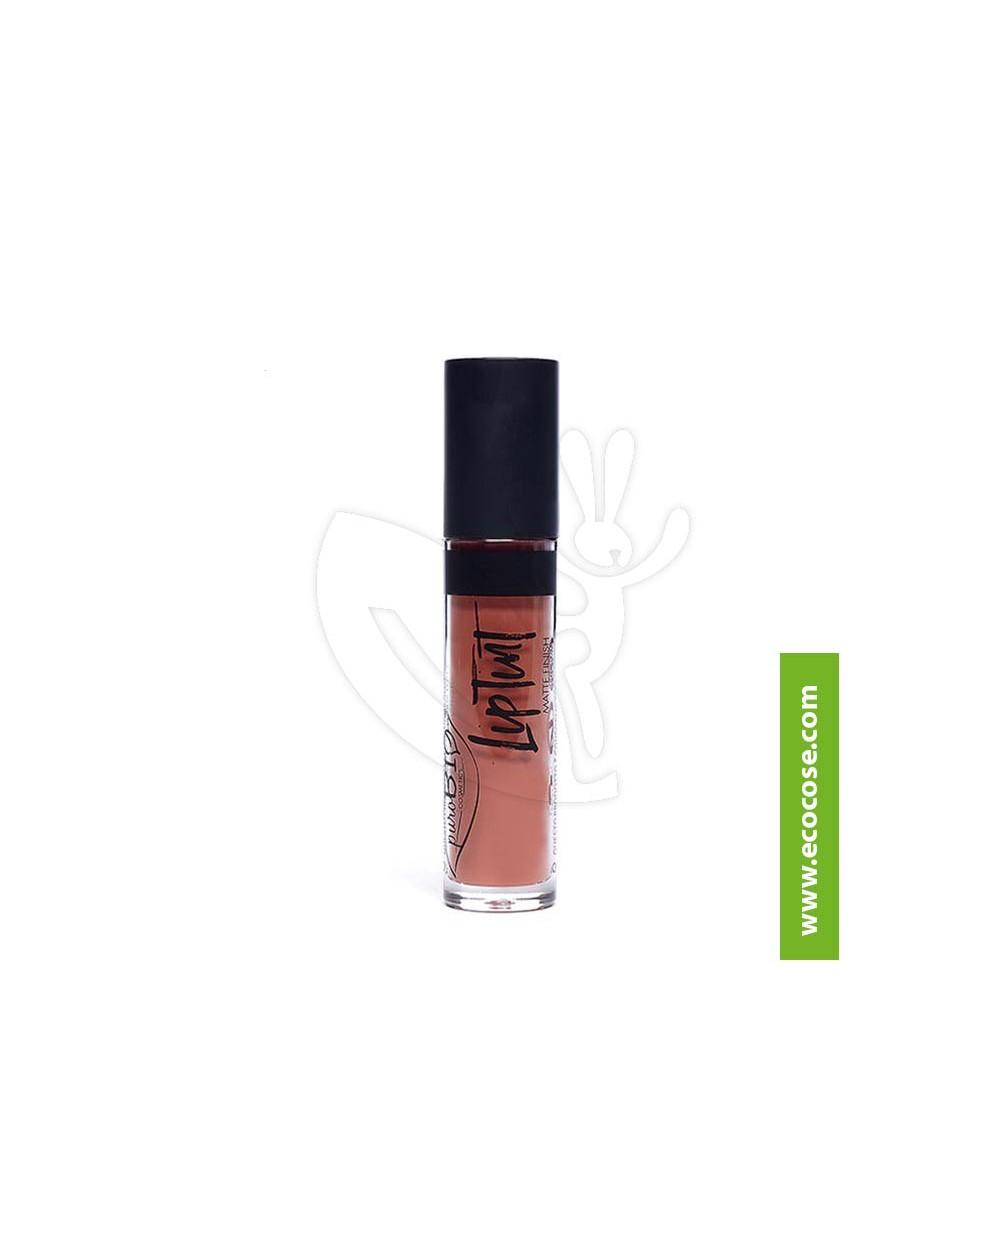 PuroBIO Cosmetics - LipTint 02 - Aragosta